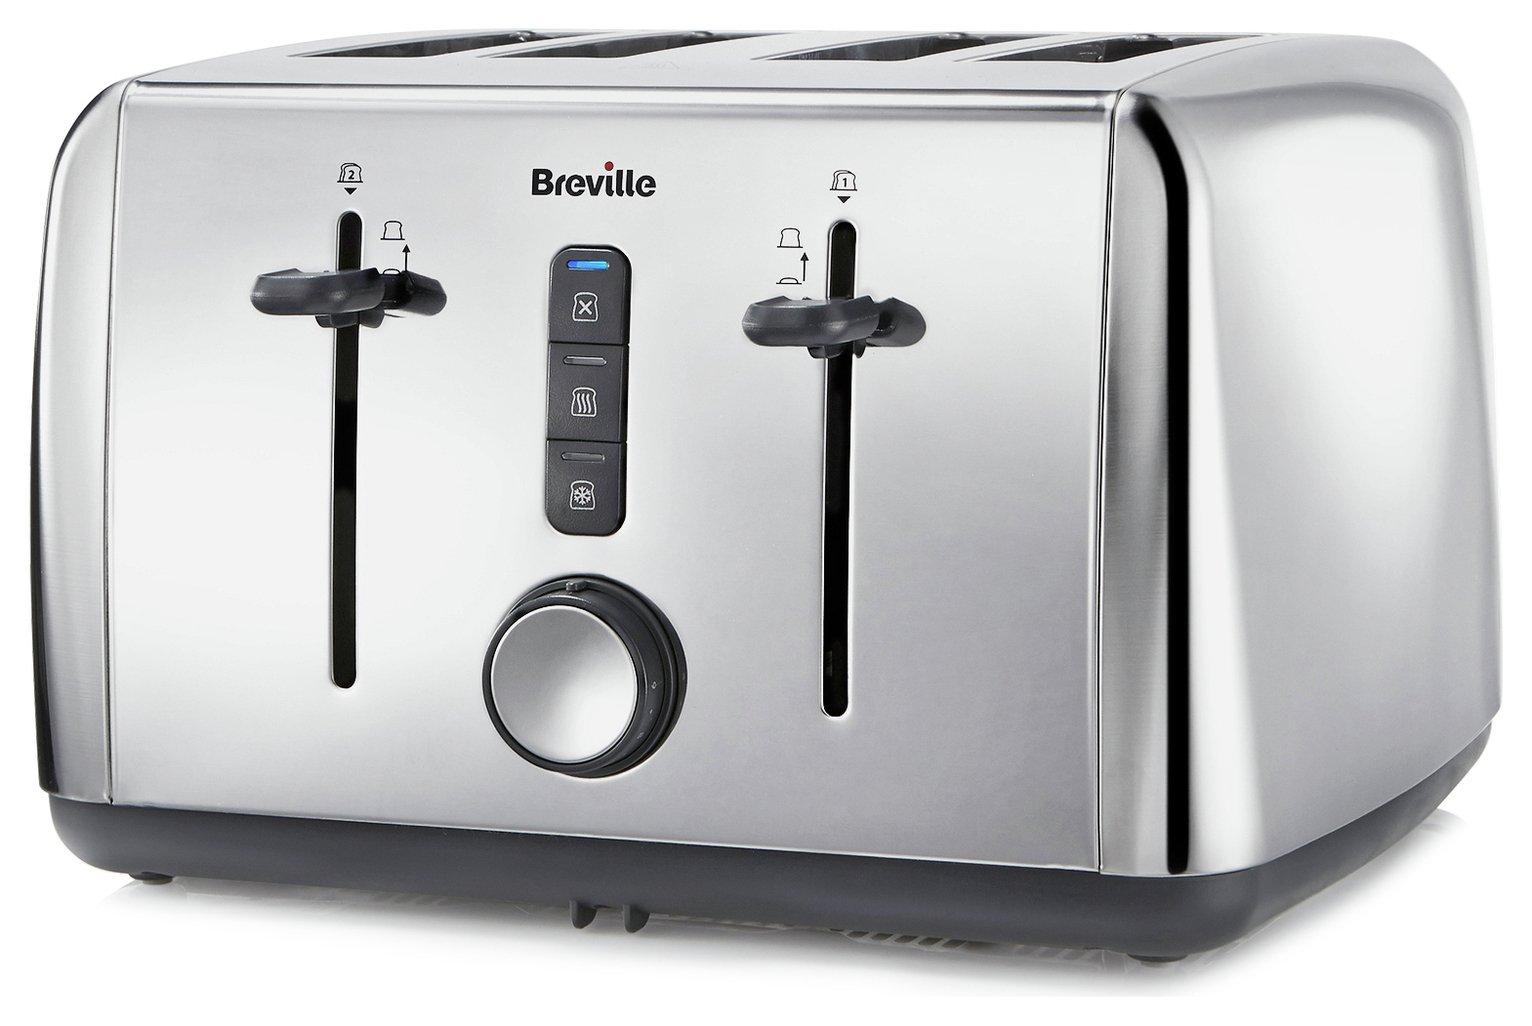 Breville - 4 Slice Toaster - Stainless Steel